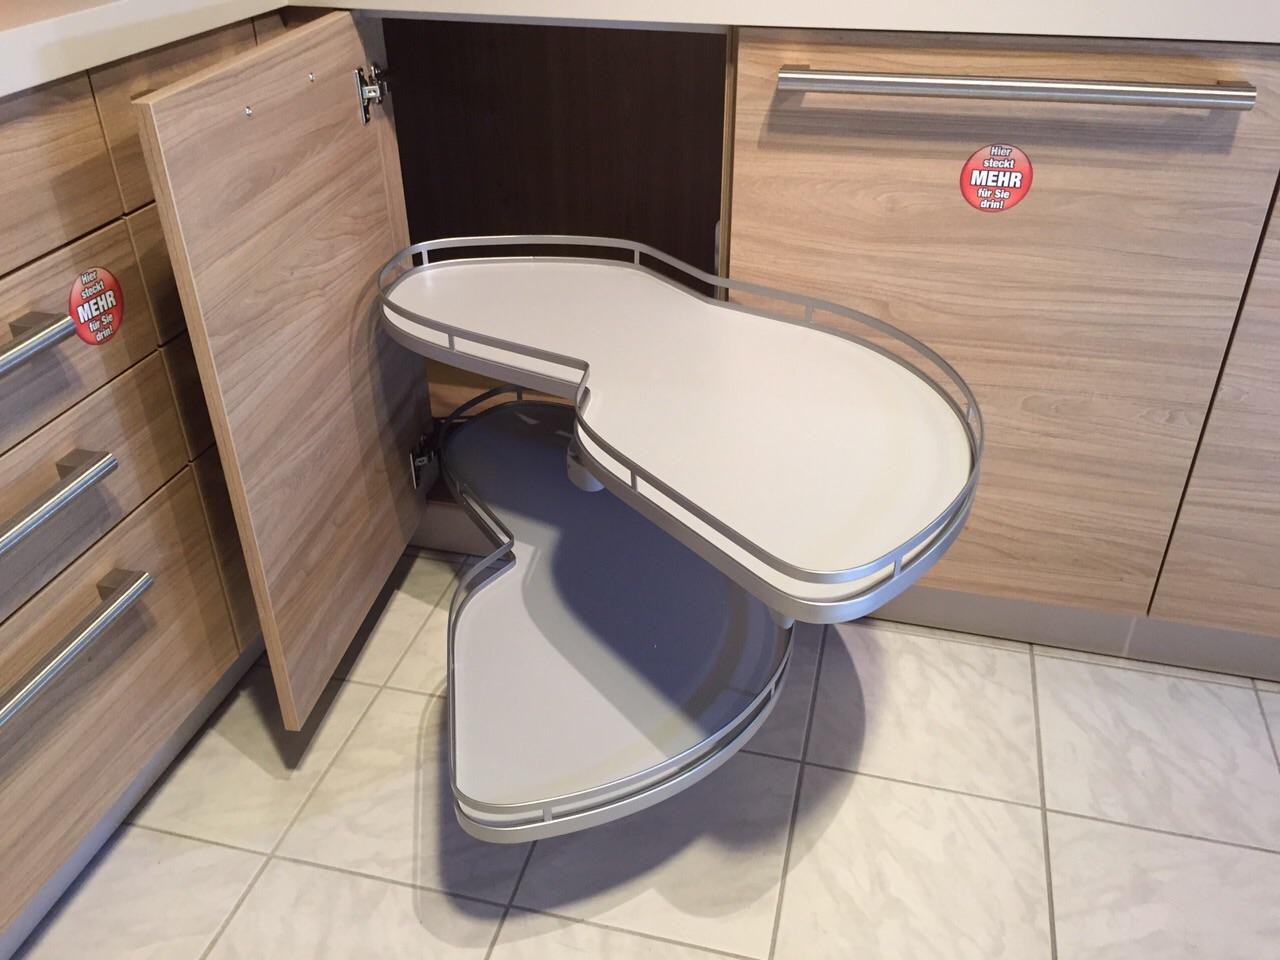 Full Size of Nolte Eckschrank Küche Eckschrank Küche 60x60 Eckschrank Küche Weiß Hochglanz Eckschrank Küche Auszug Küche Eckschrank Küche